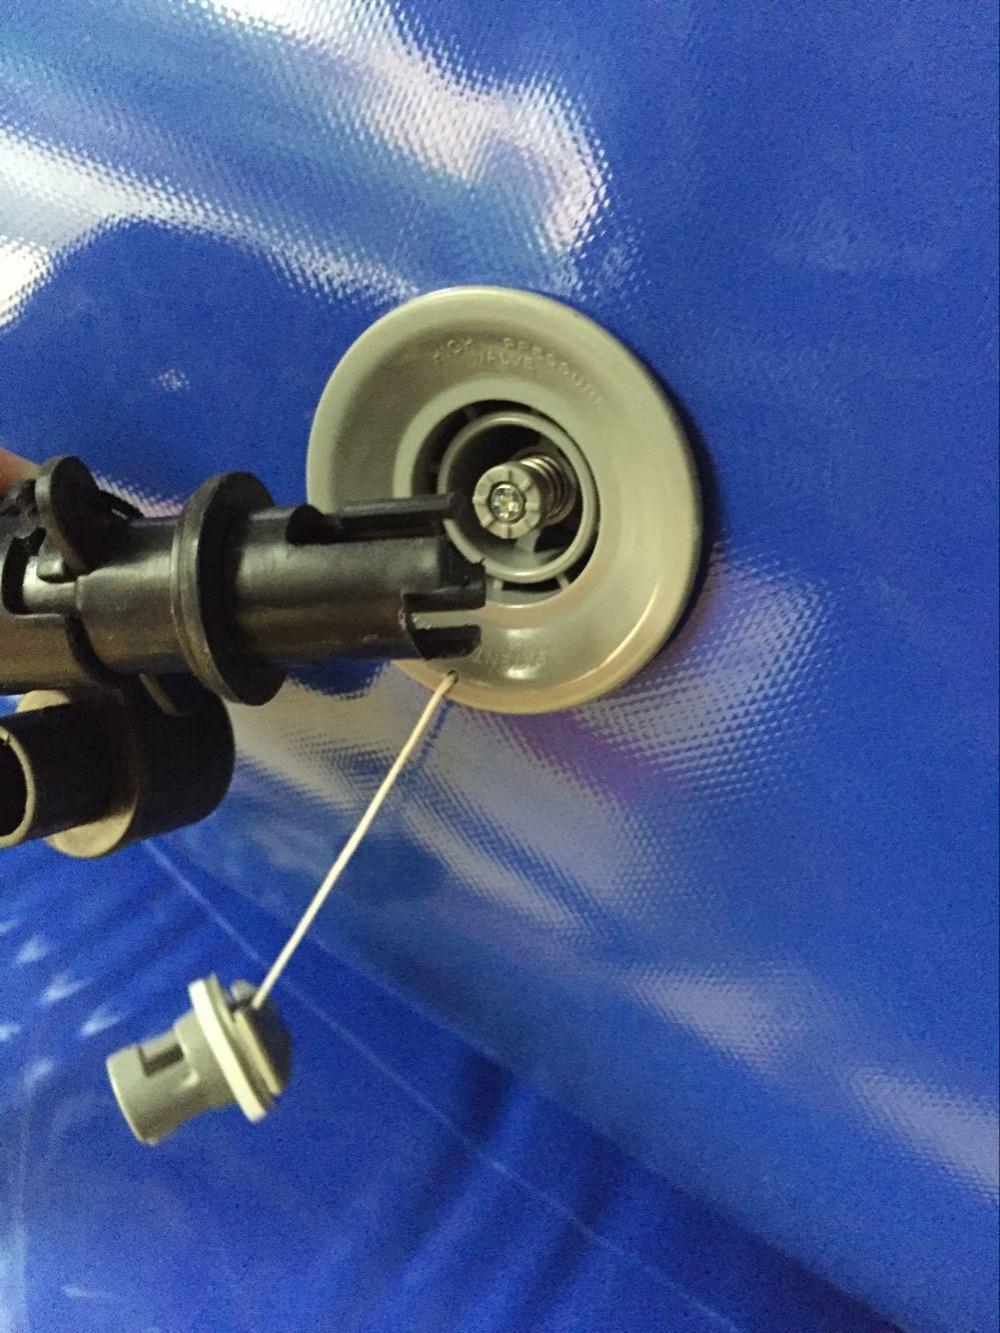 Gumenjak odbijač vanjski 2.5m prilagođene gumenjak trampolin PVC - Zabava na otvorenom i sportovi - Foto 6